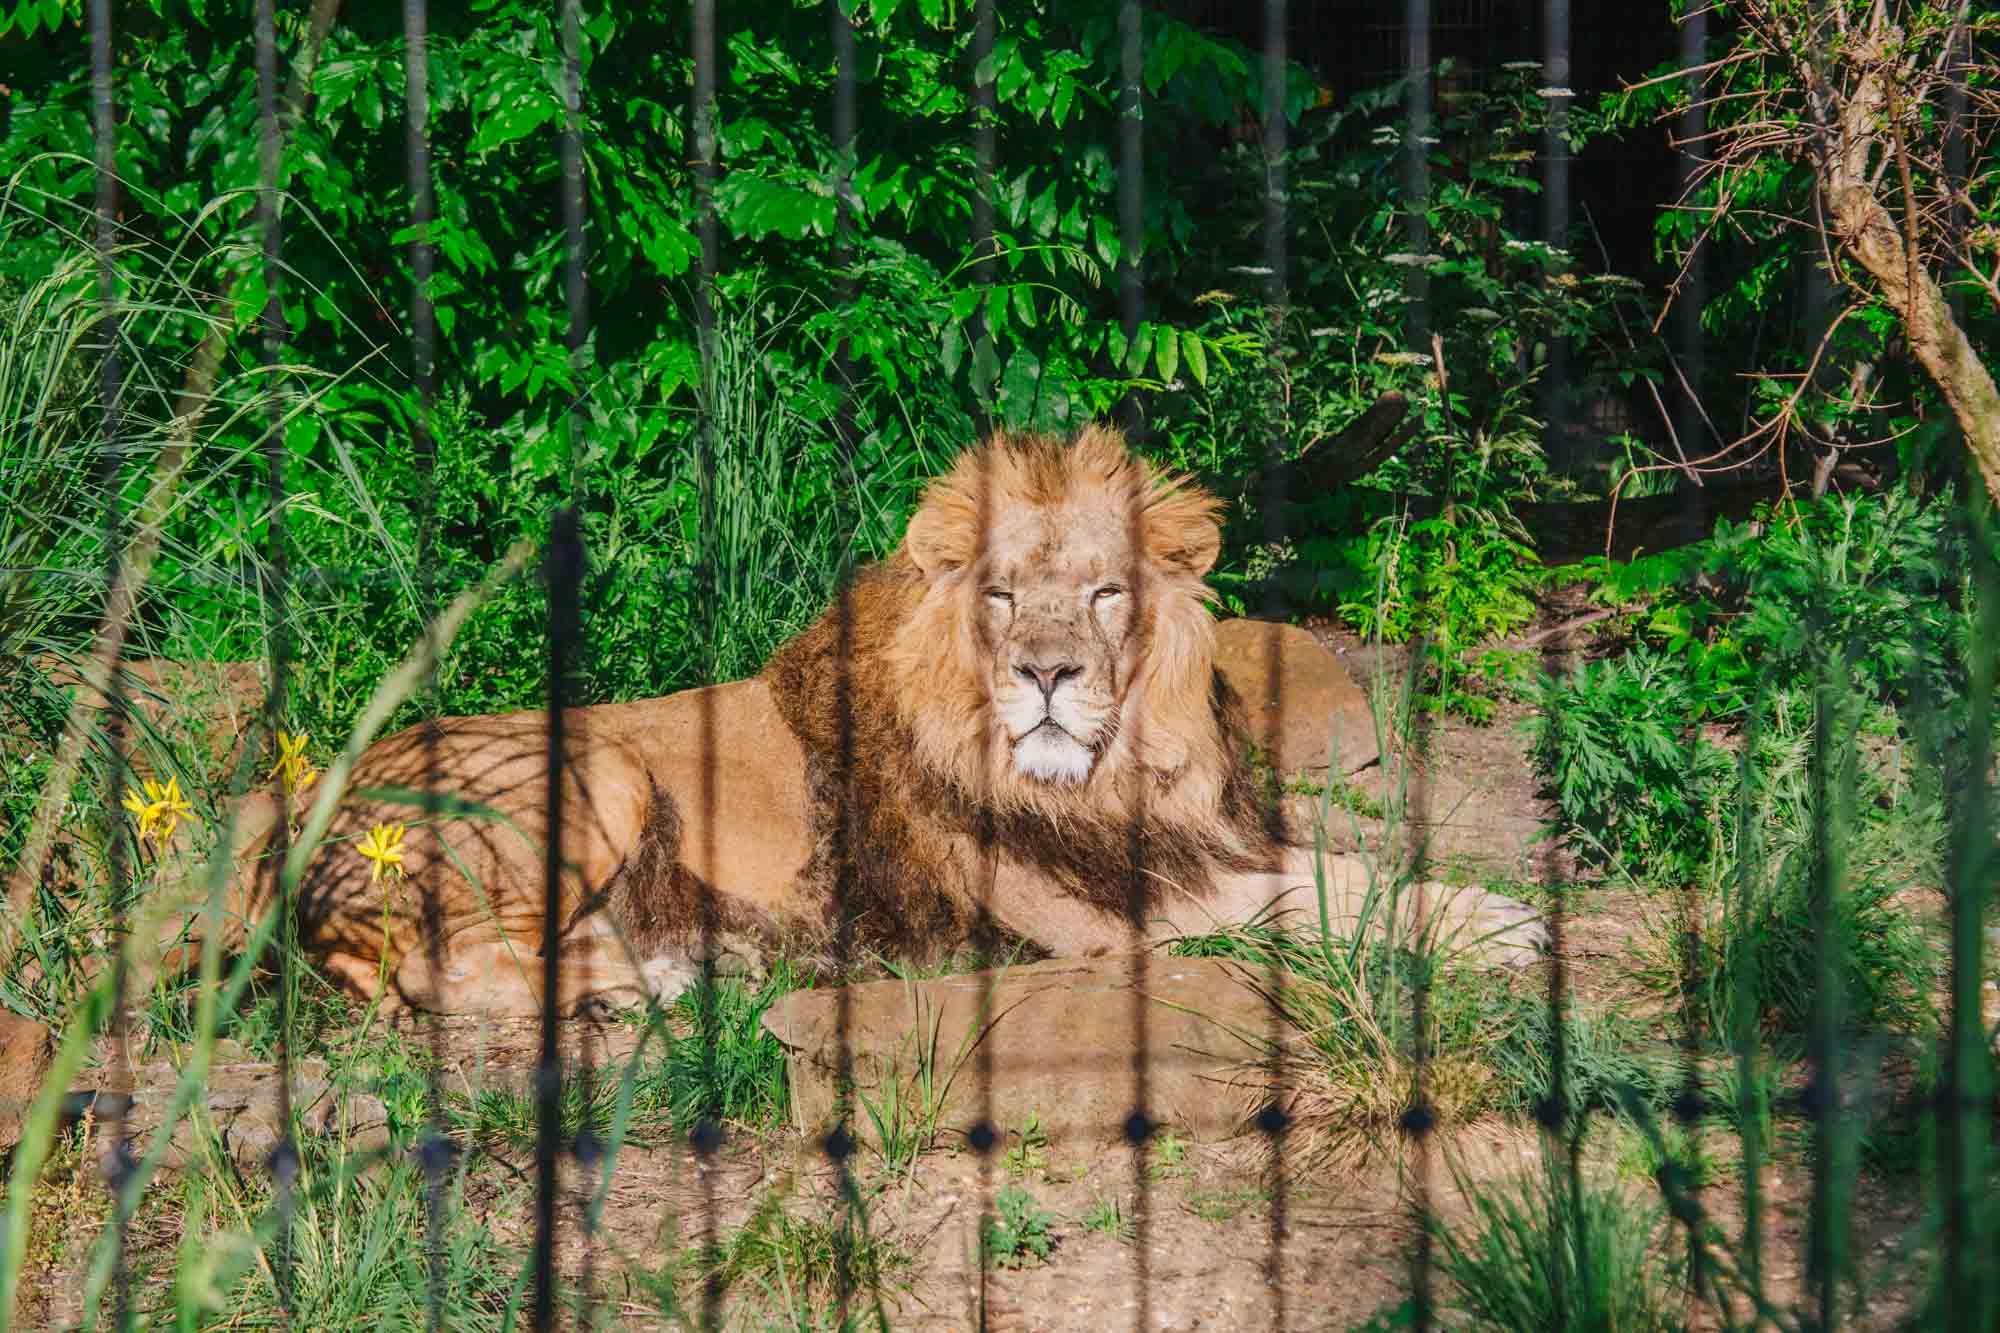 London Zoo - Lions